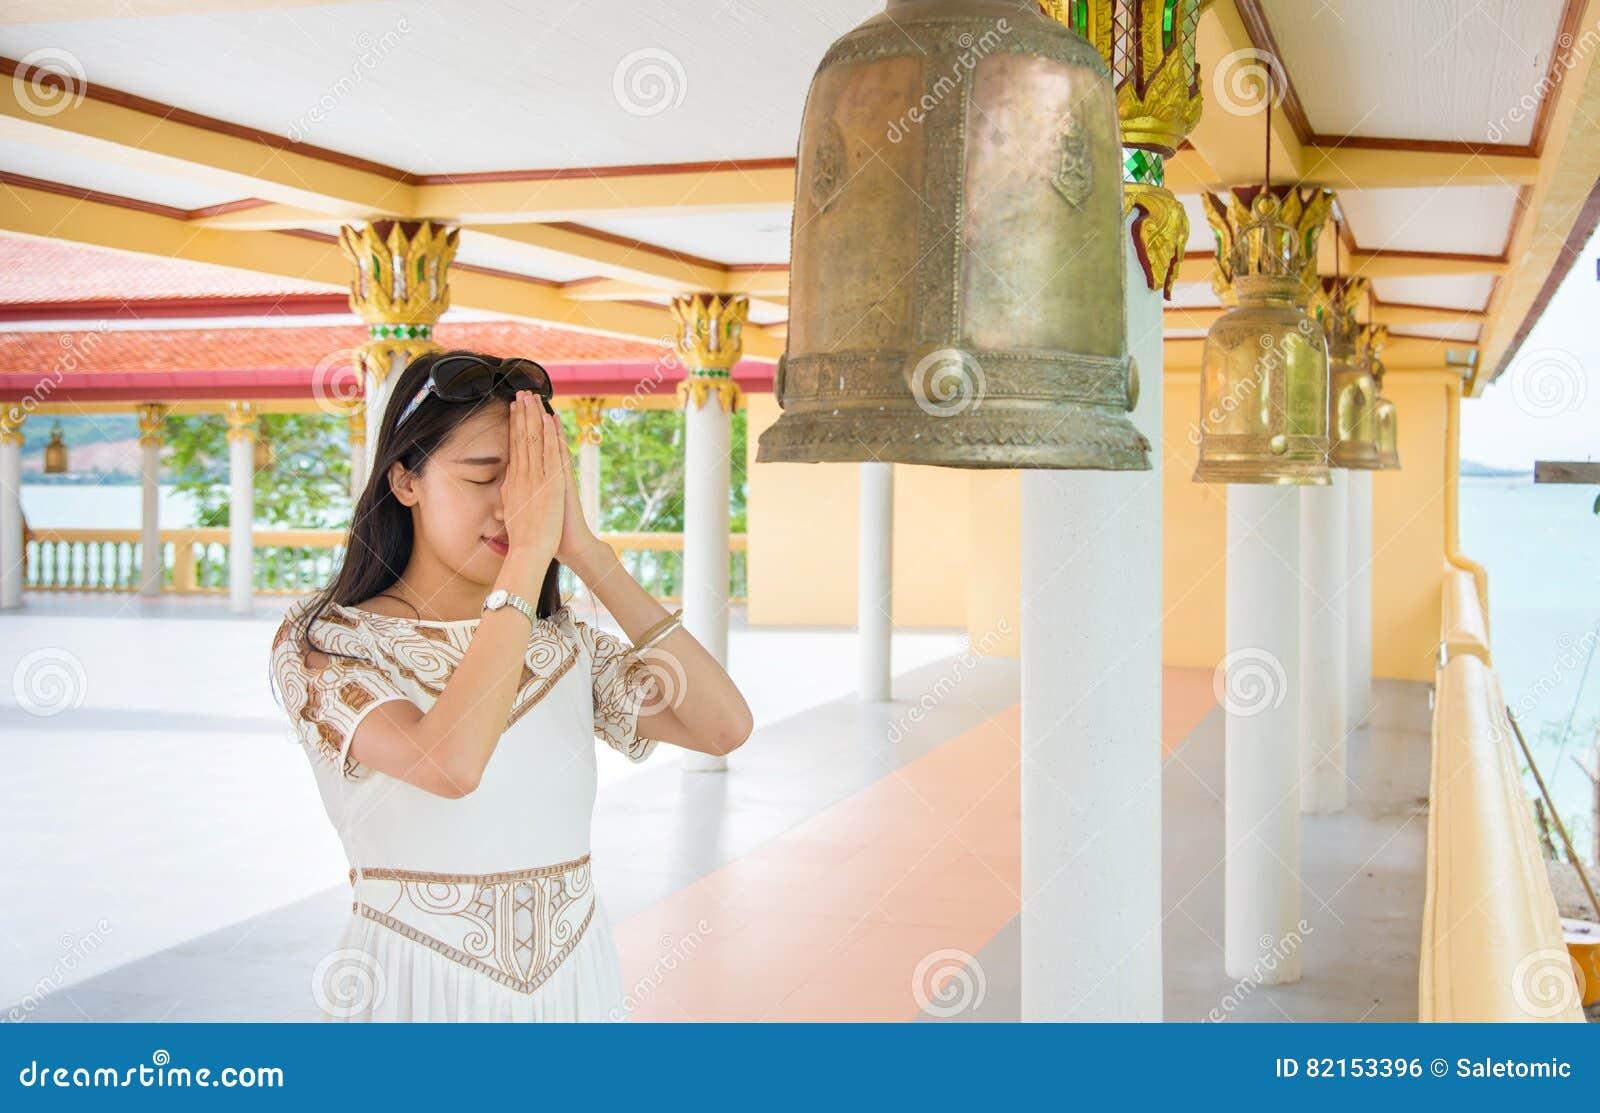 8aea2149d1 Buddhist girl praying inside the temple. Young buddhist girl praying inside  the temple royalty free